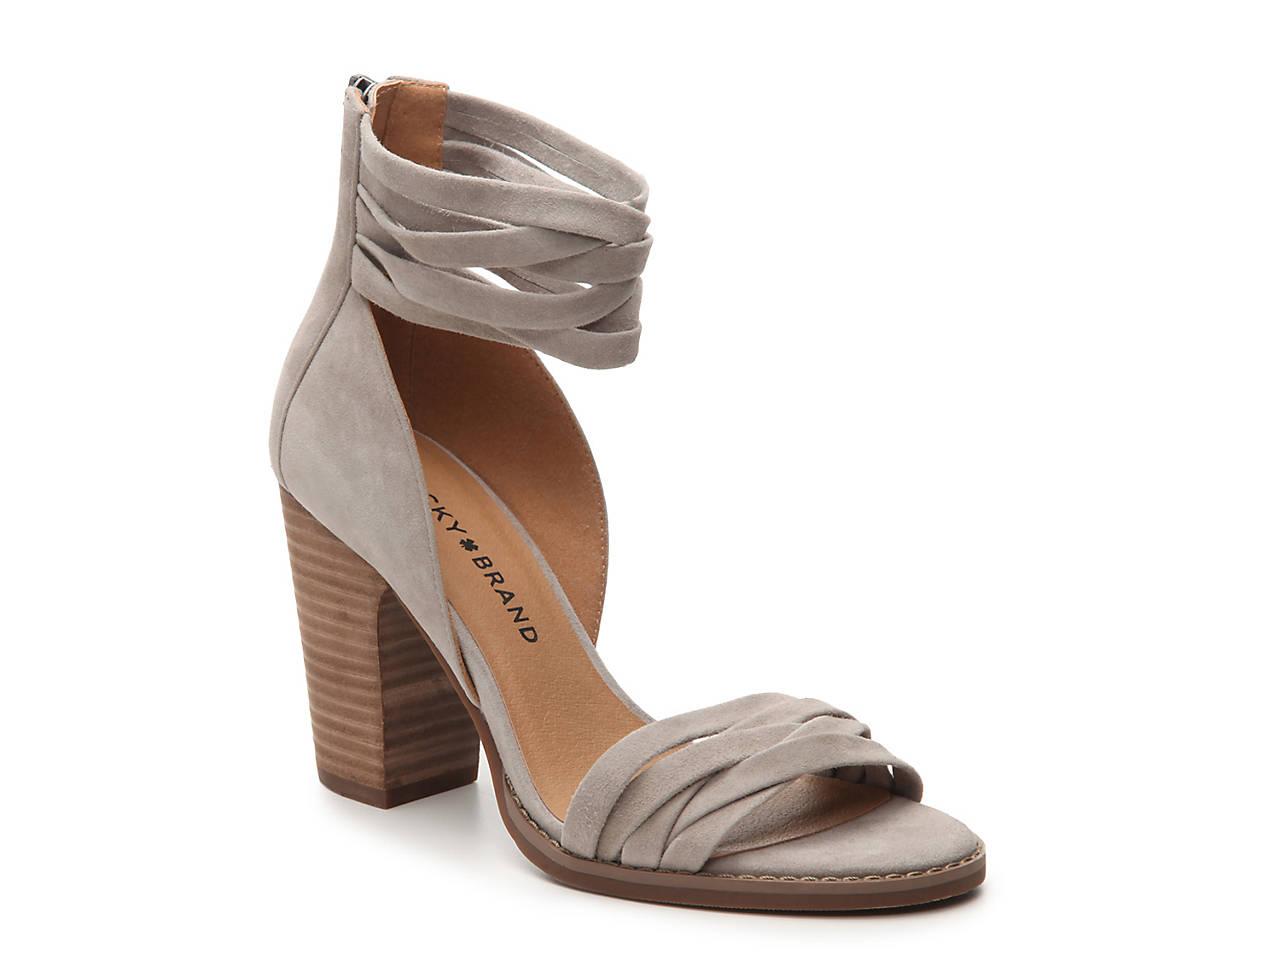 bf5de39b849 Lucky Brand Lakisha Sandal Women s Shoes